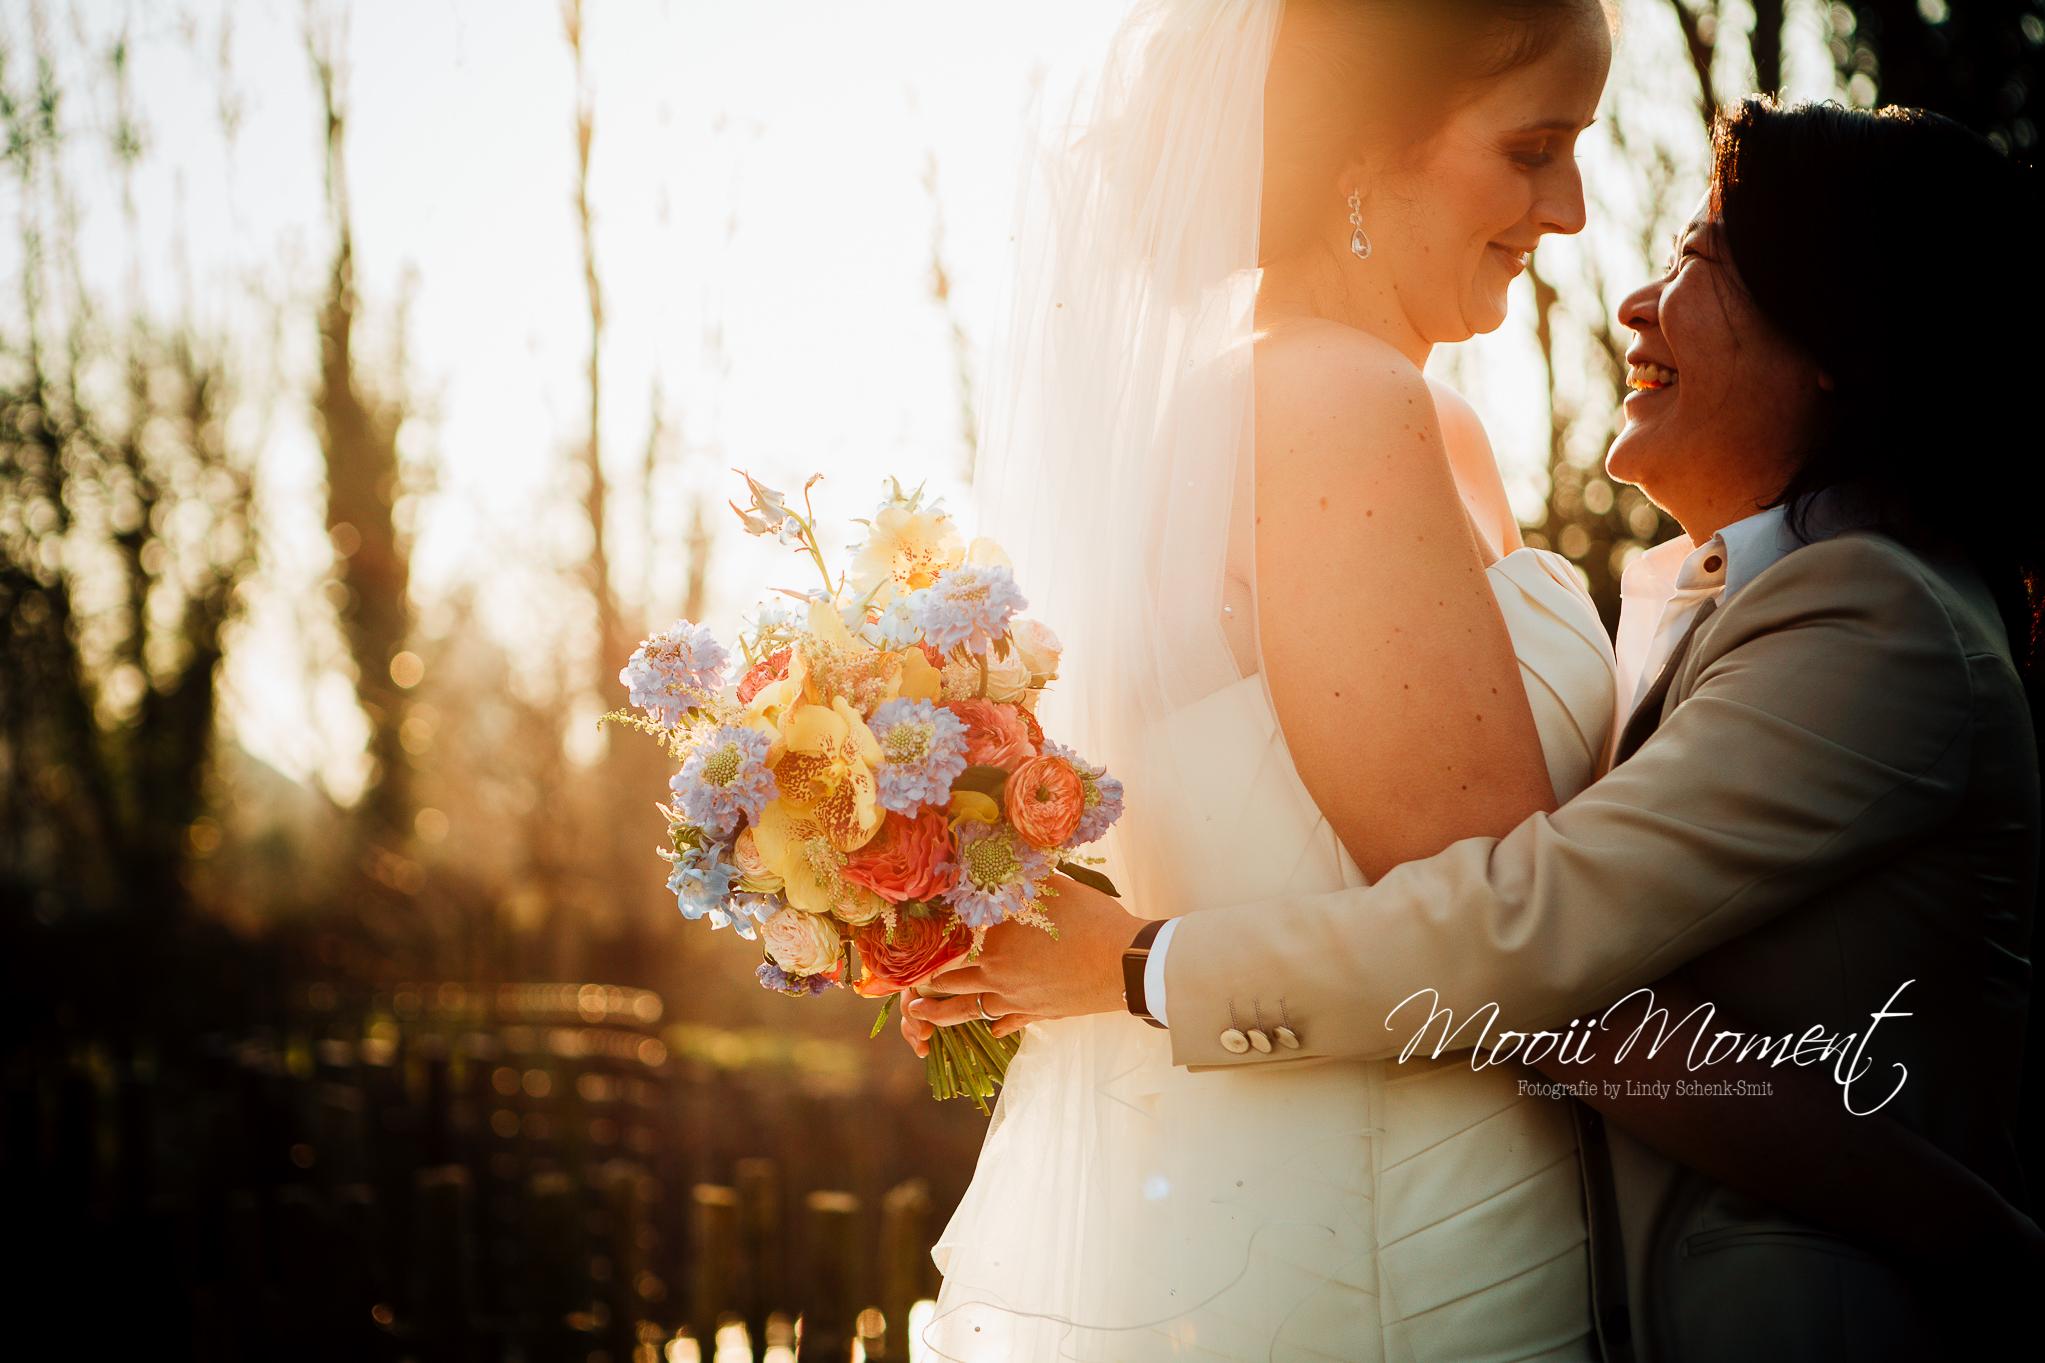 Bruidsreportage de Fabriek Zuidermeer 18-02-2018